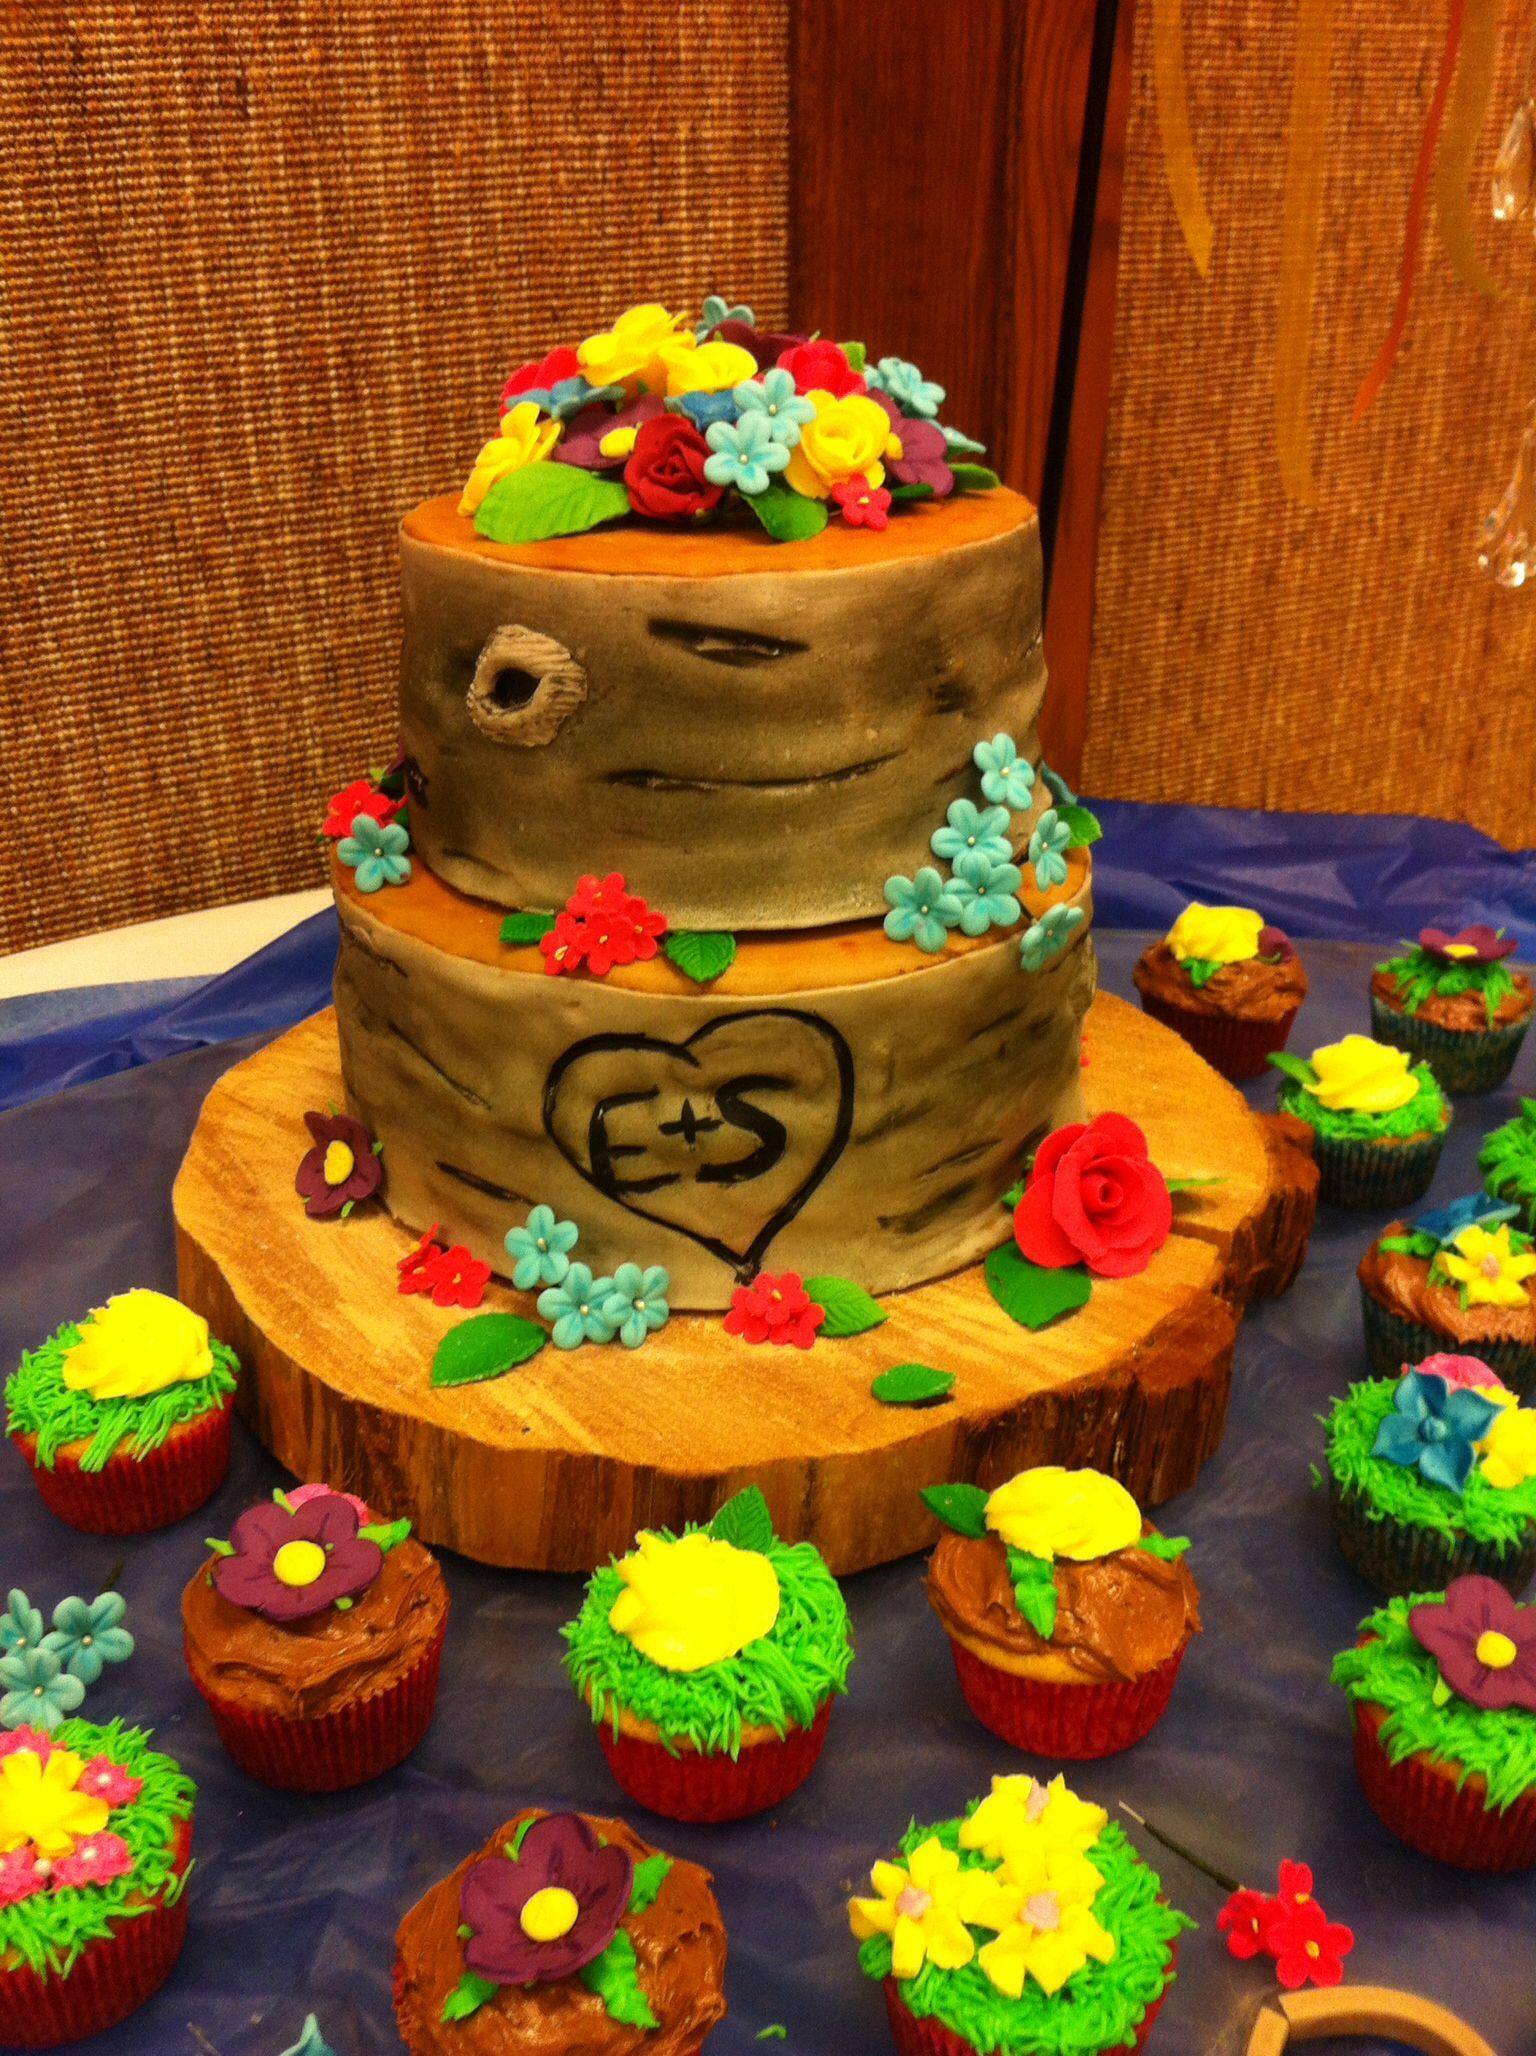 My latest cake